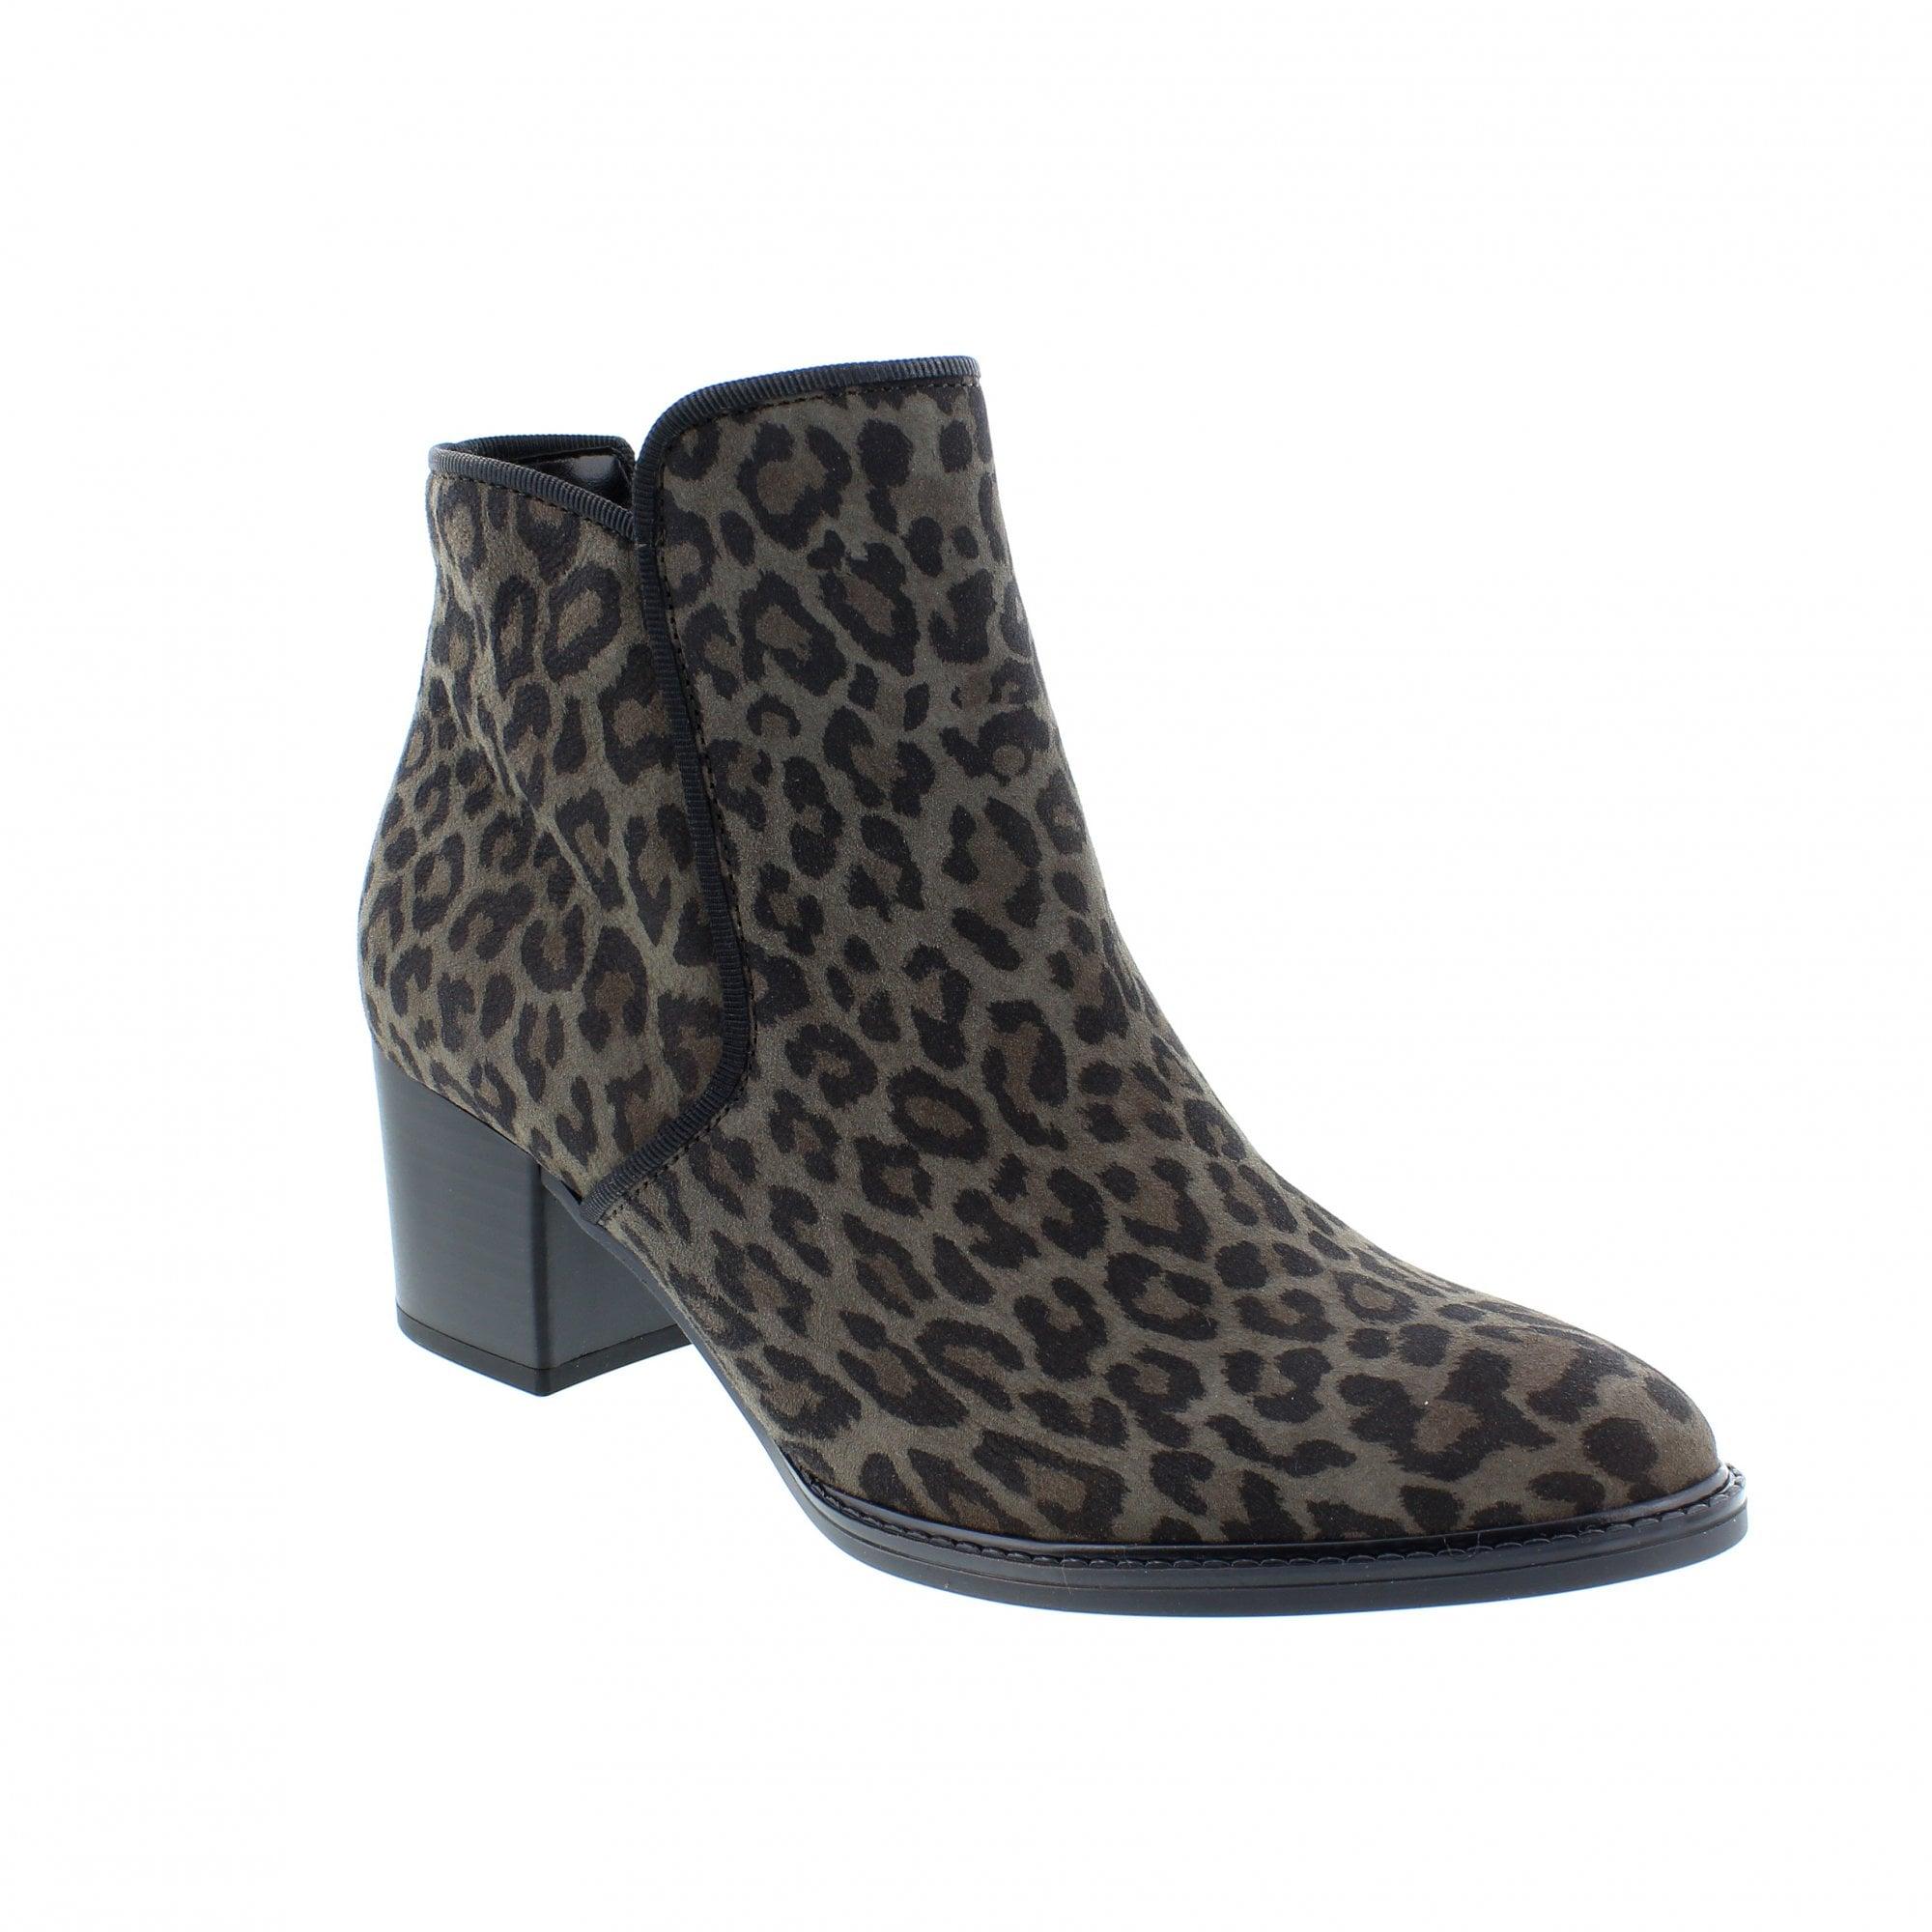 animal print ankle booties